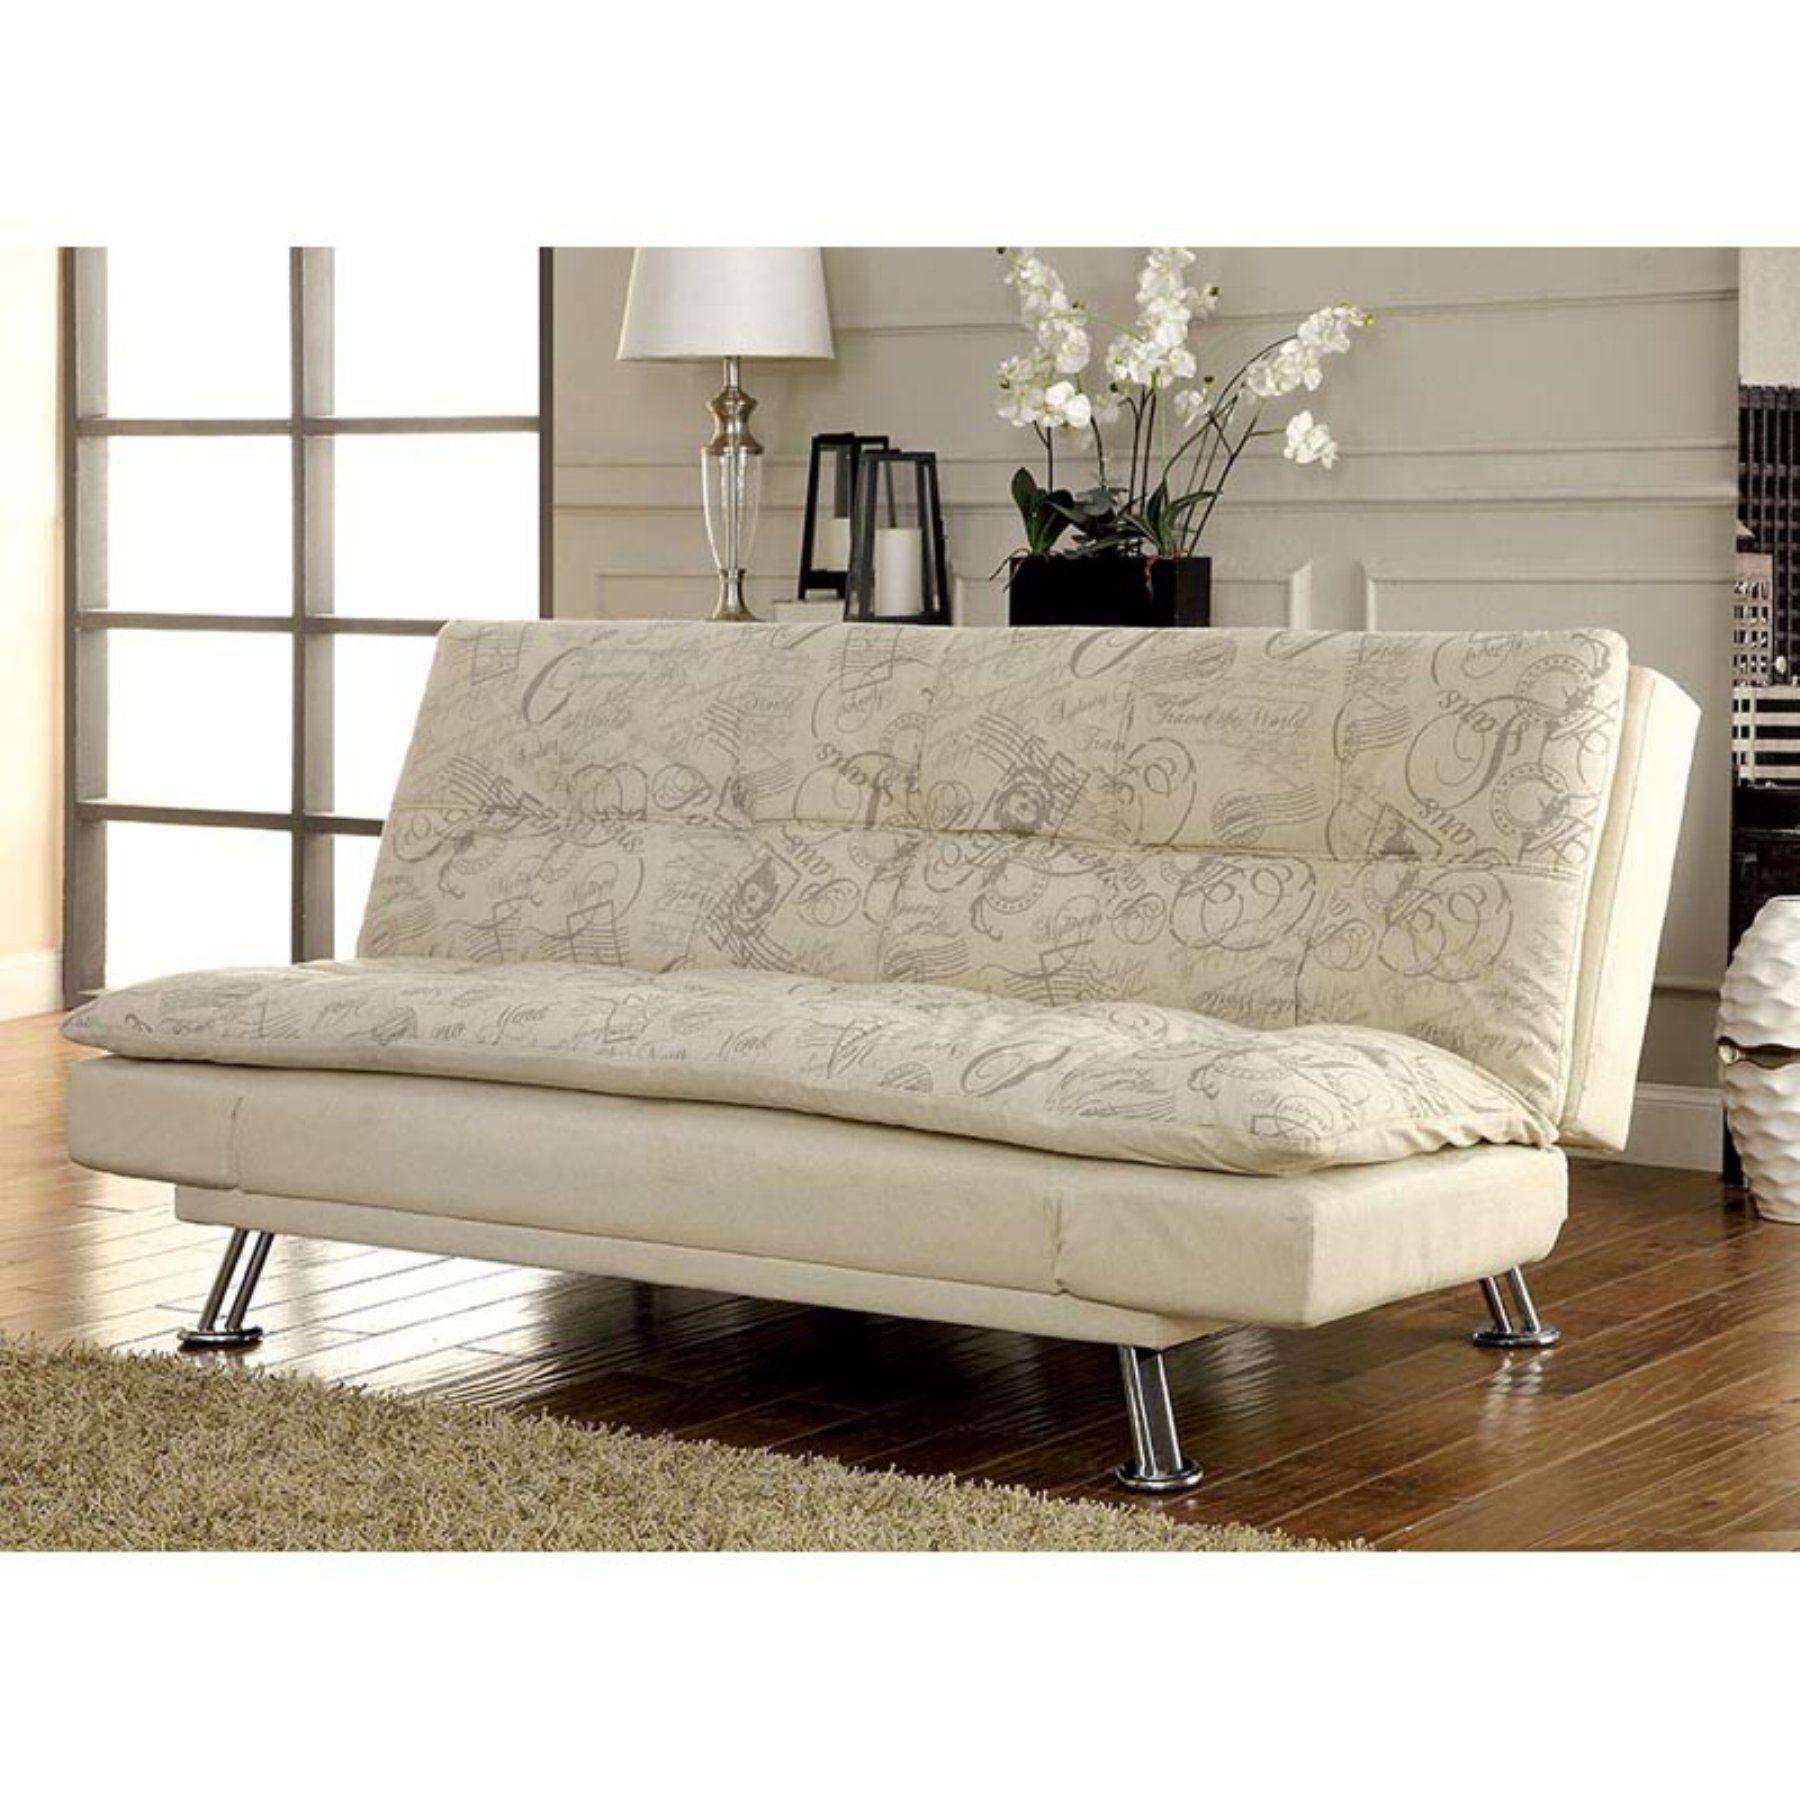 White Futon West Elm Gray Couch Chair Sleeper Sofas Kids Reading Nooks